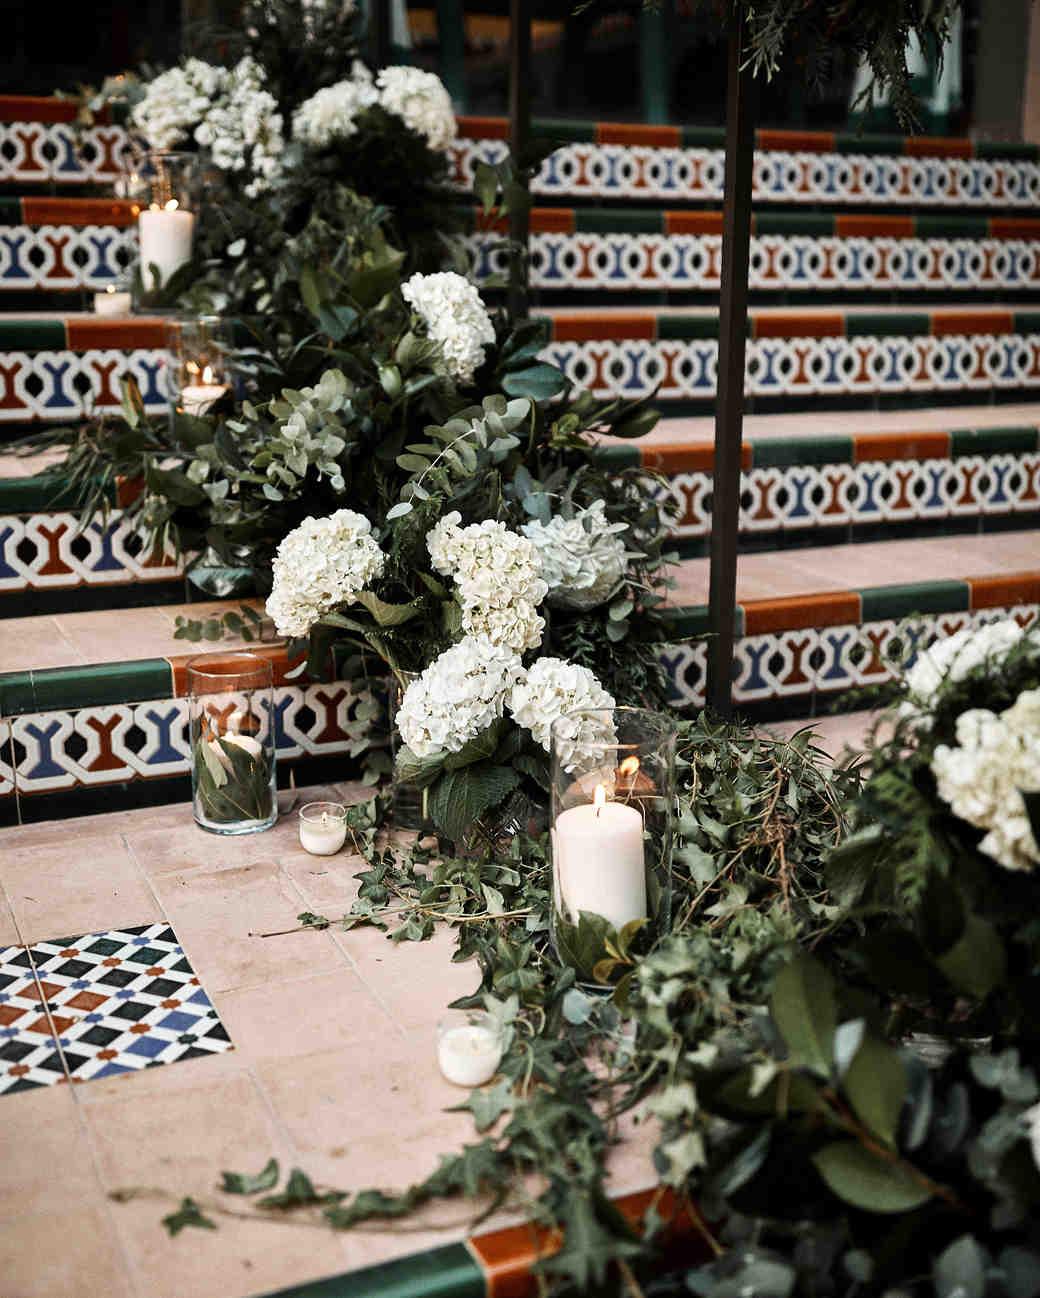 karolina sorab wedding flower arrangement on stairs